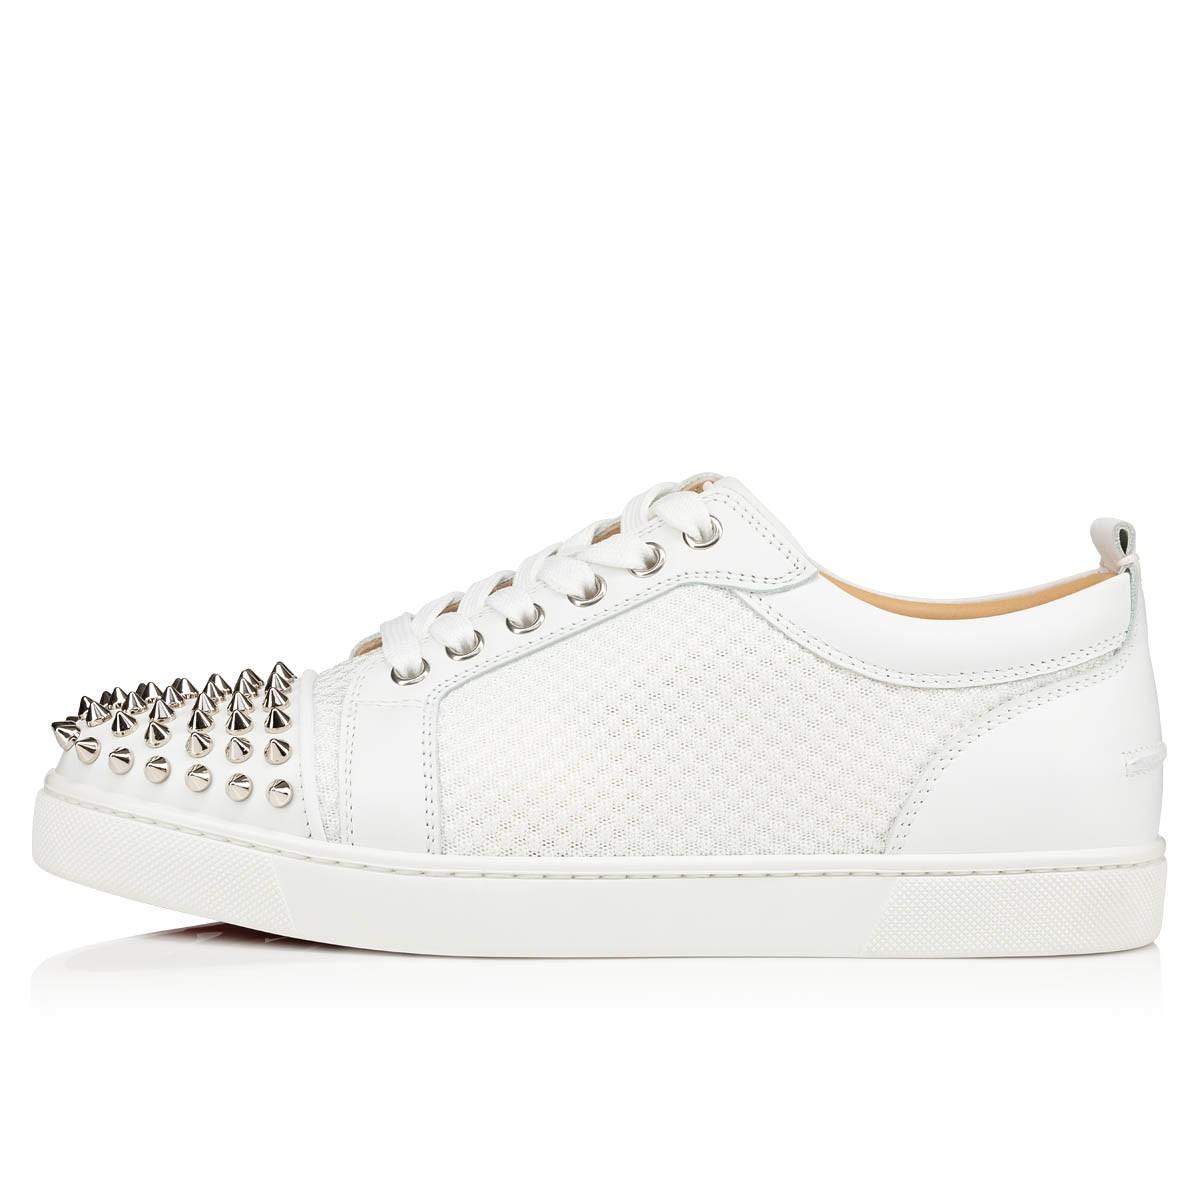 99d98975a8f AC LOUIS JUNIOR SPIKES WOMAN White Fabric and Calfskin - Women Shoes -  Christian Louboutin